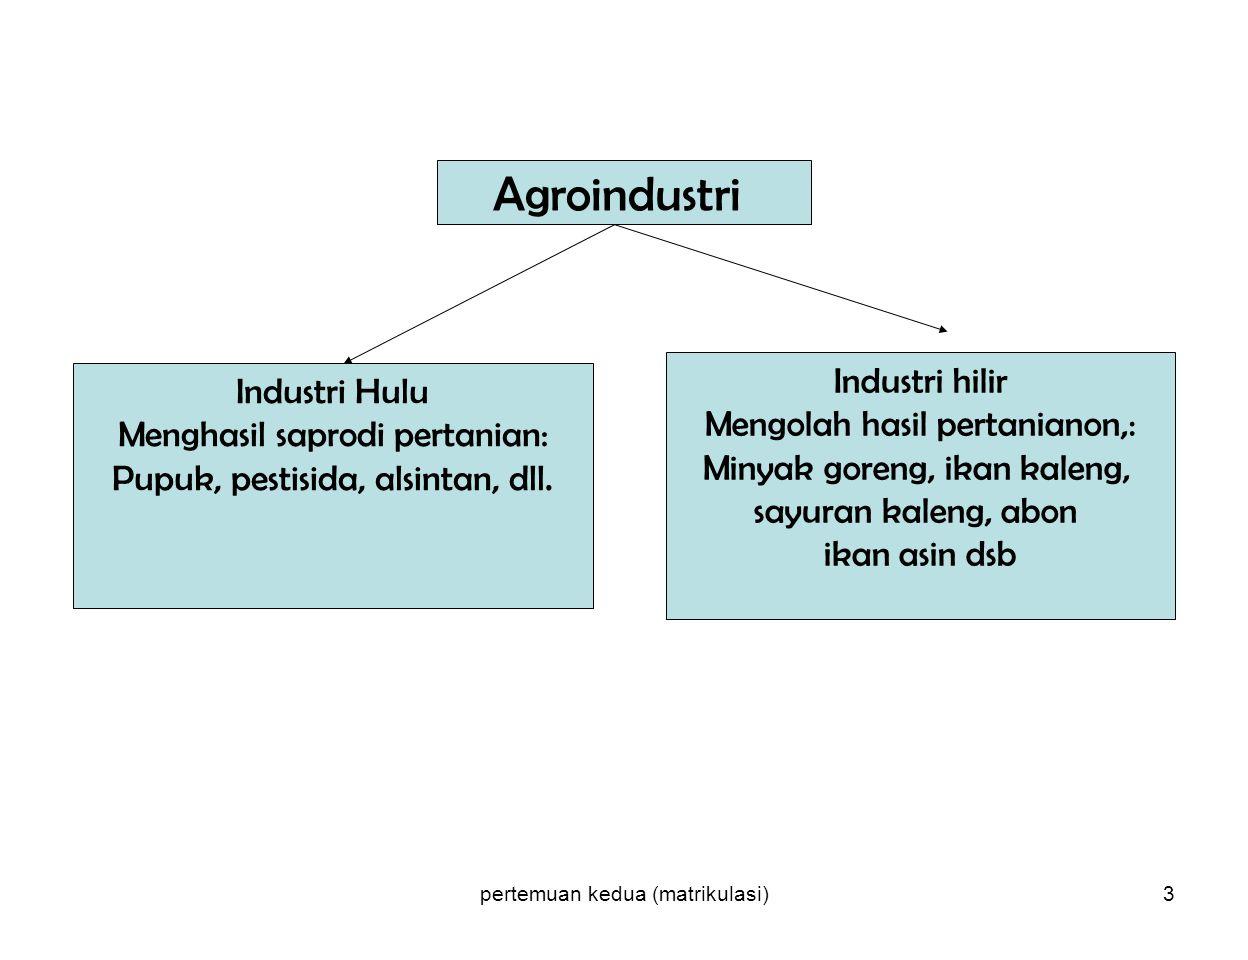 pertemuan kedua (matrikulasi)3 Agroindustri Industri Hulu Menghasil saprodi pertanian: Pupuk, pestisida, alsintan, dll.